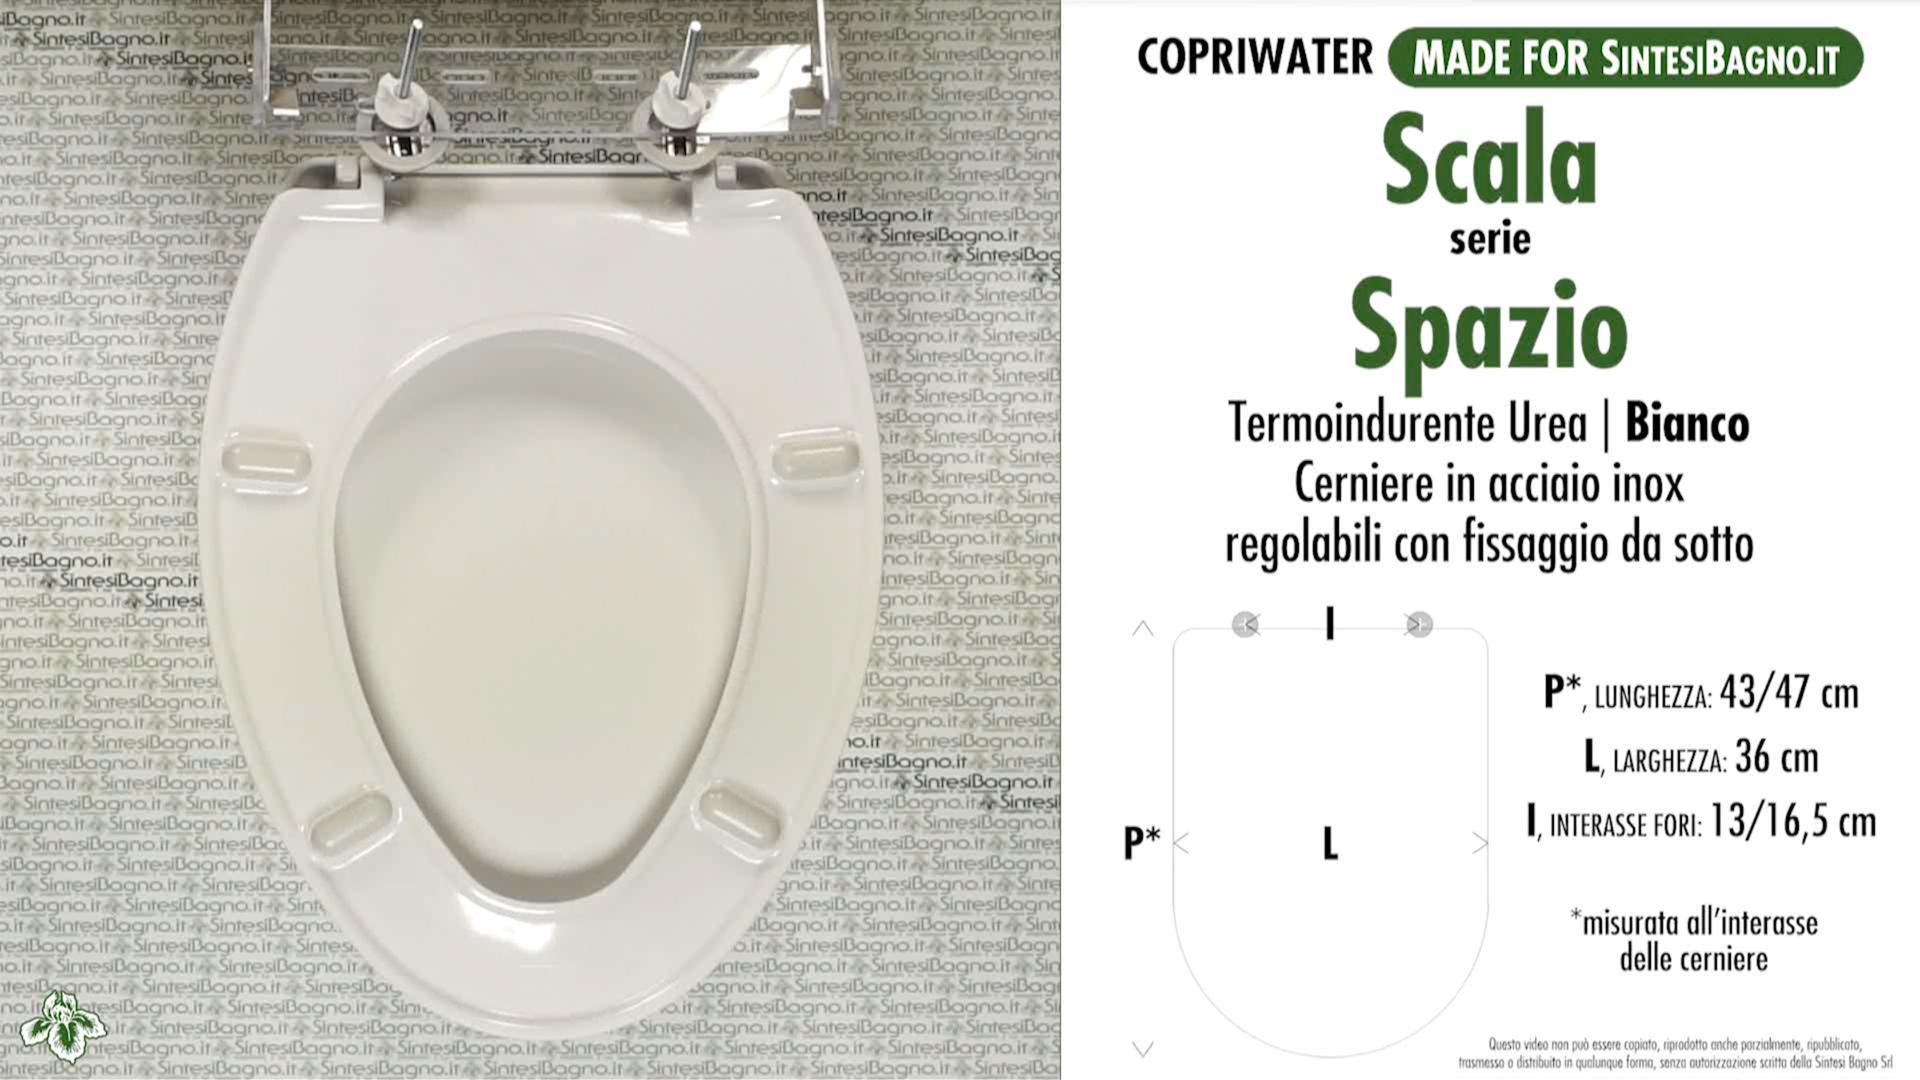 scheda-tecnica-datasheet-copriwater-scala-serie-spazio